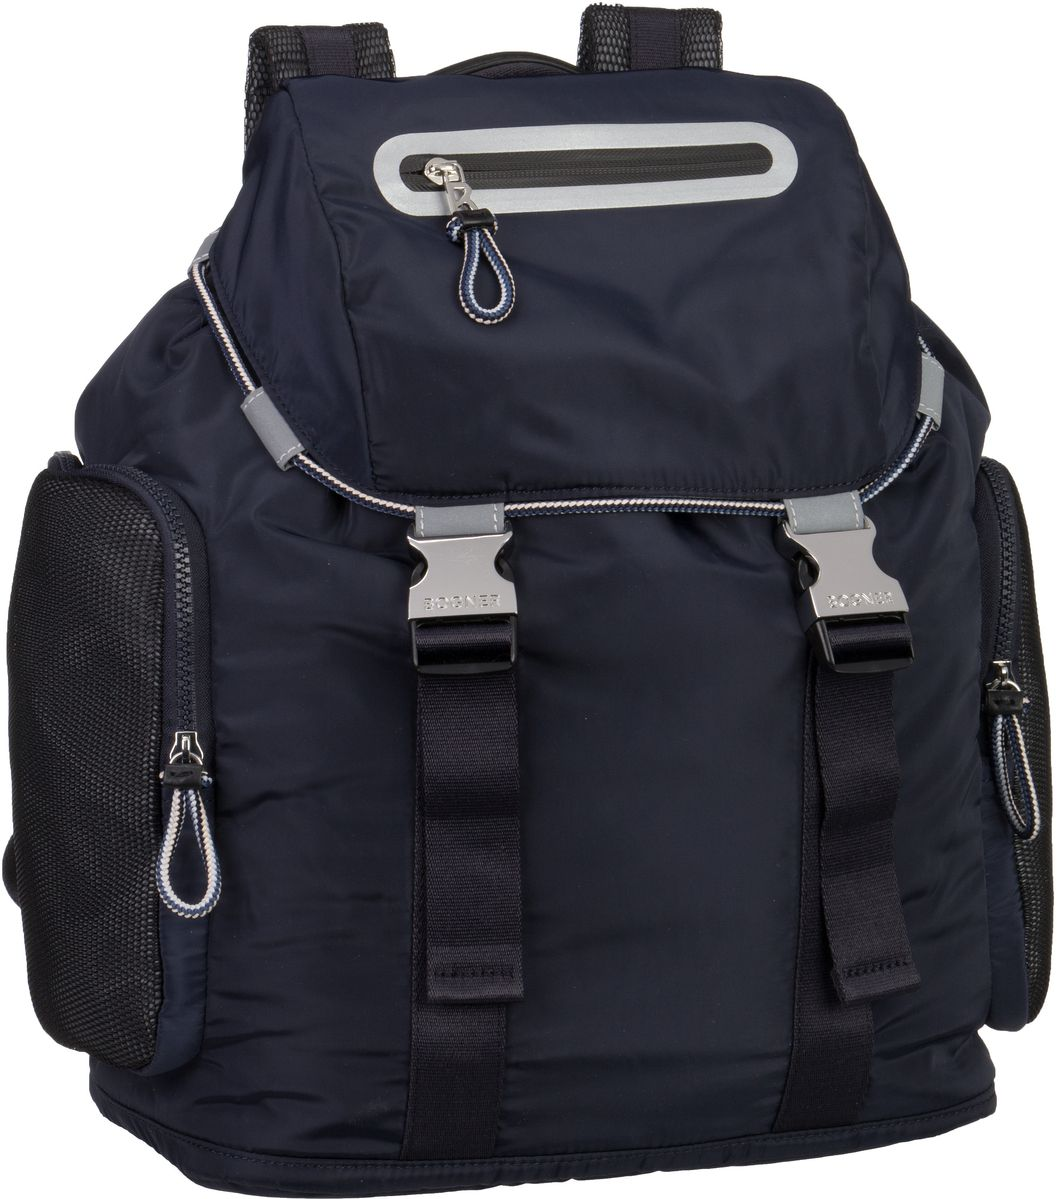 Rucksack / Daypack Athleisure Jilles Navy